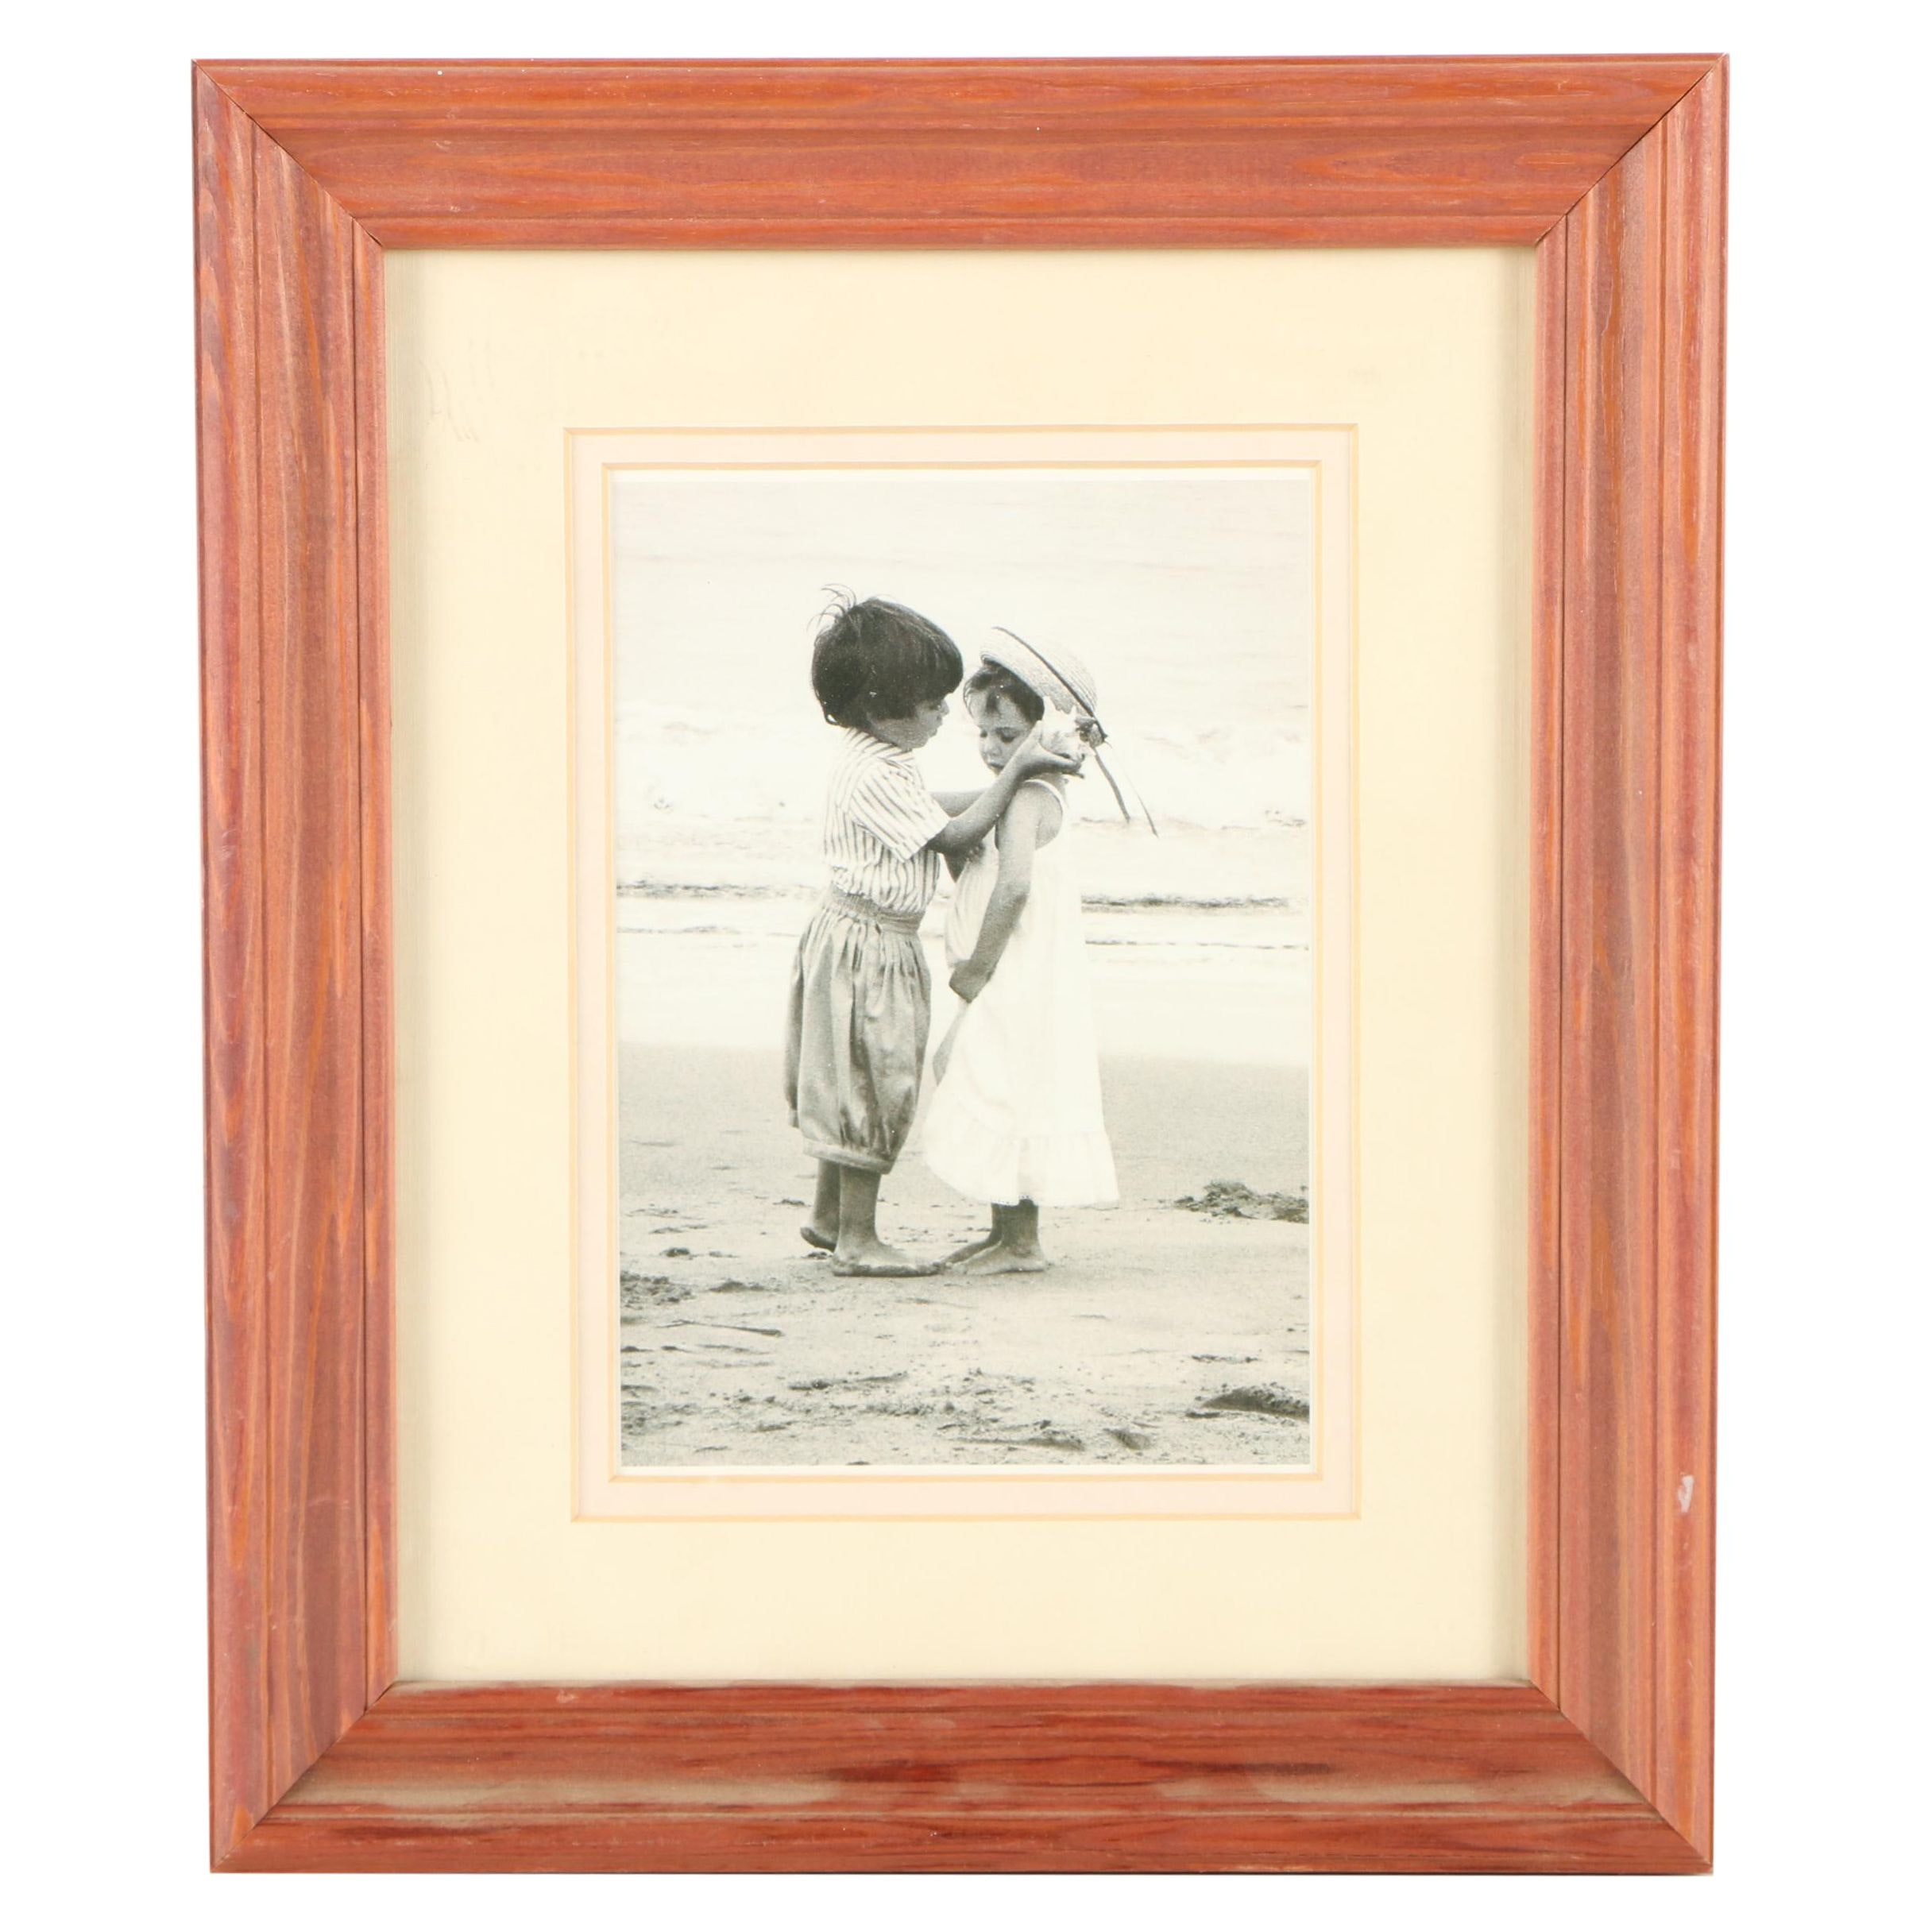 Offset Lithograph of Children on a Beach